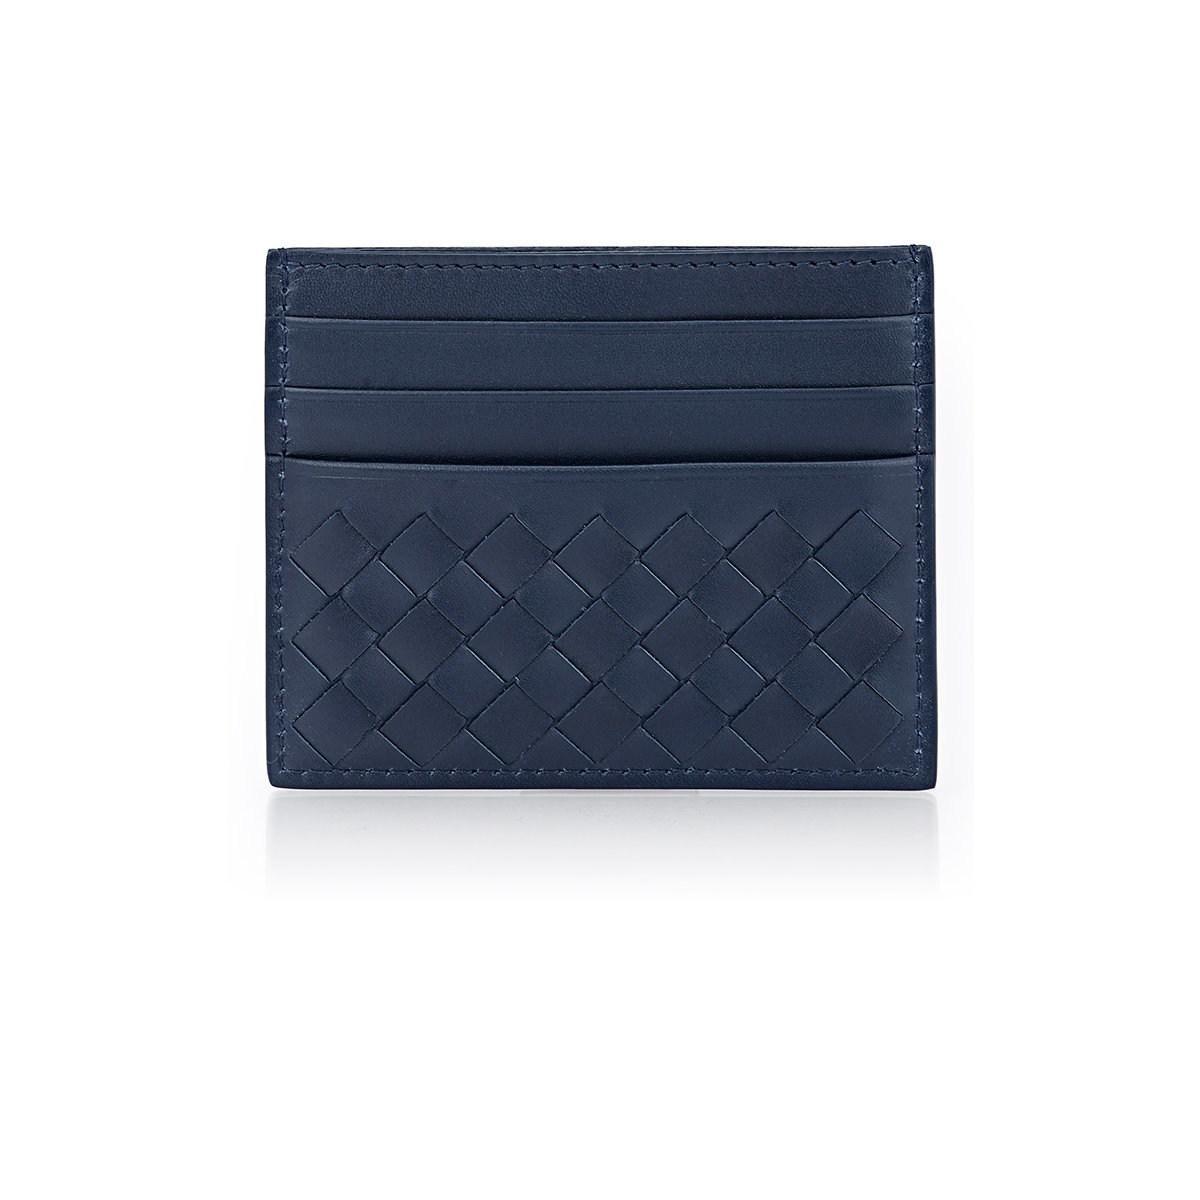 Bottega blue intrecciato card case for men with